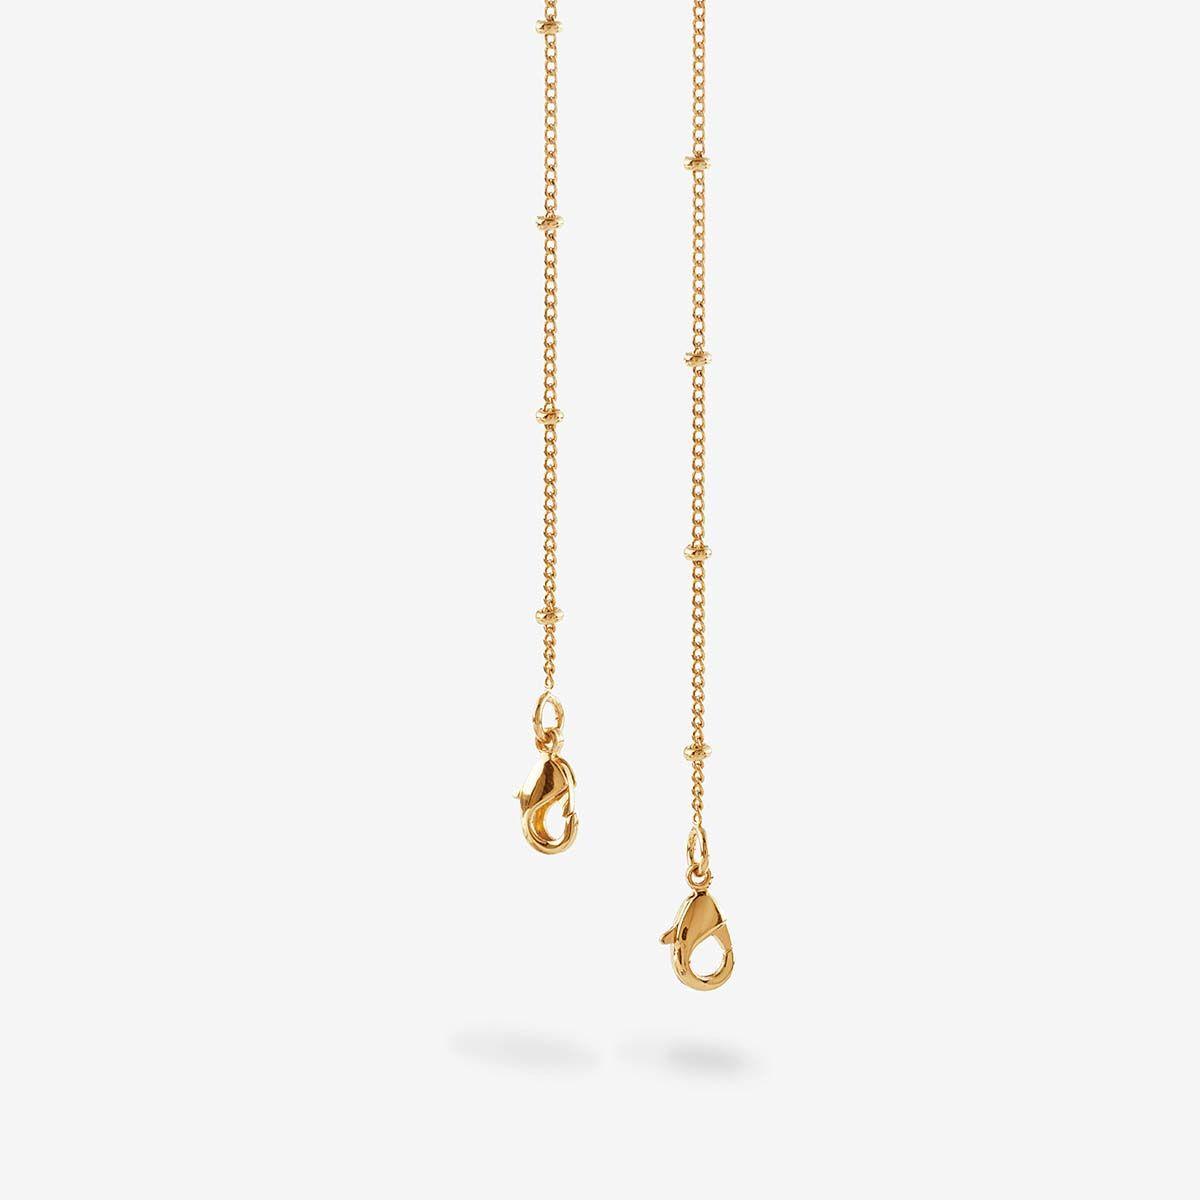 Lotta - Halsketten - 18k vergoldet